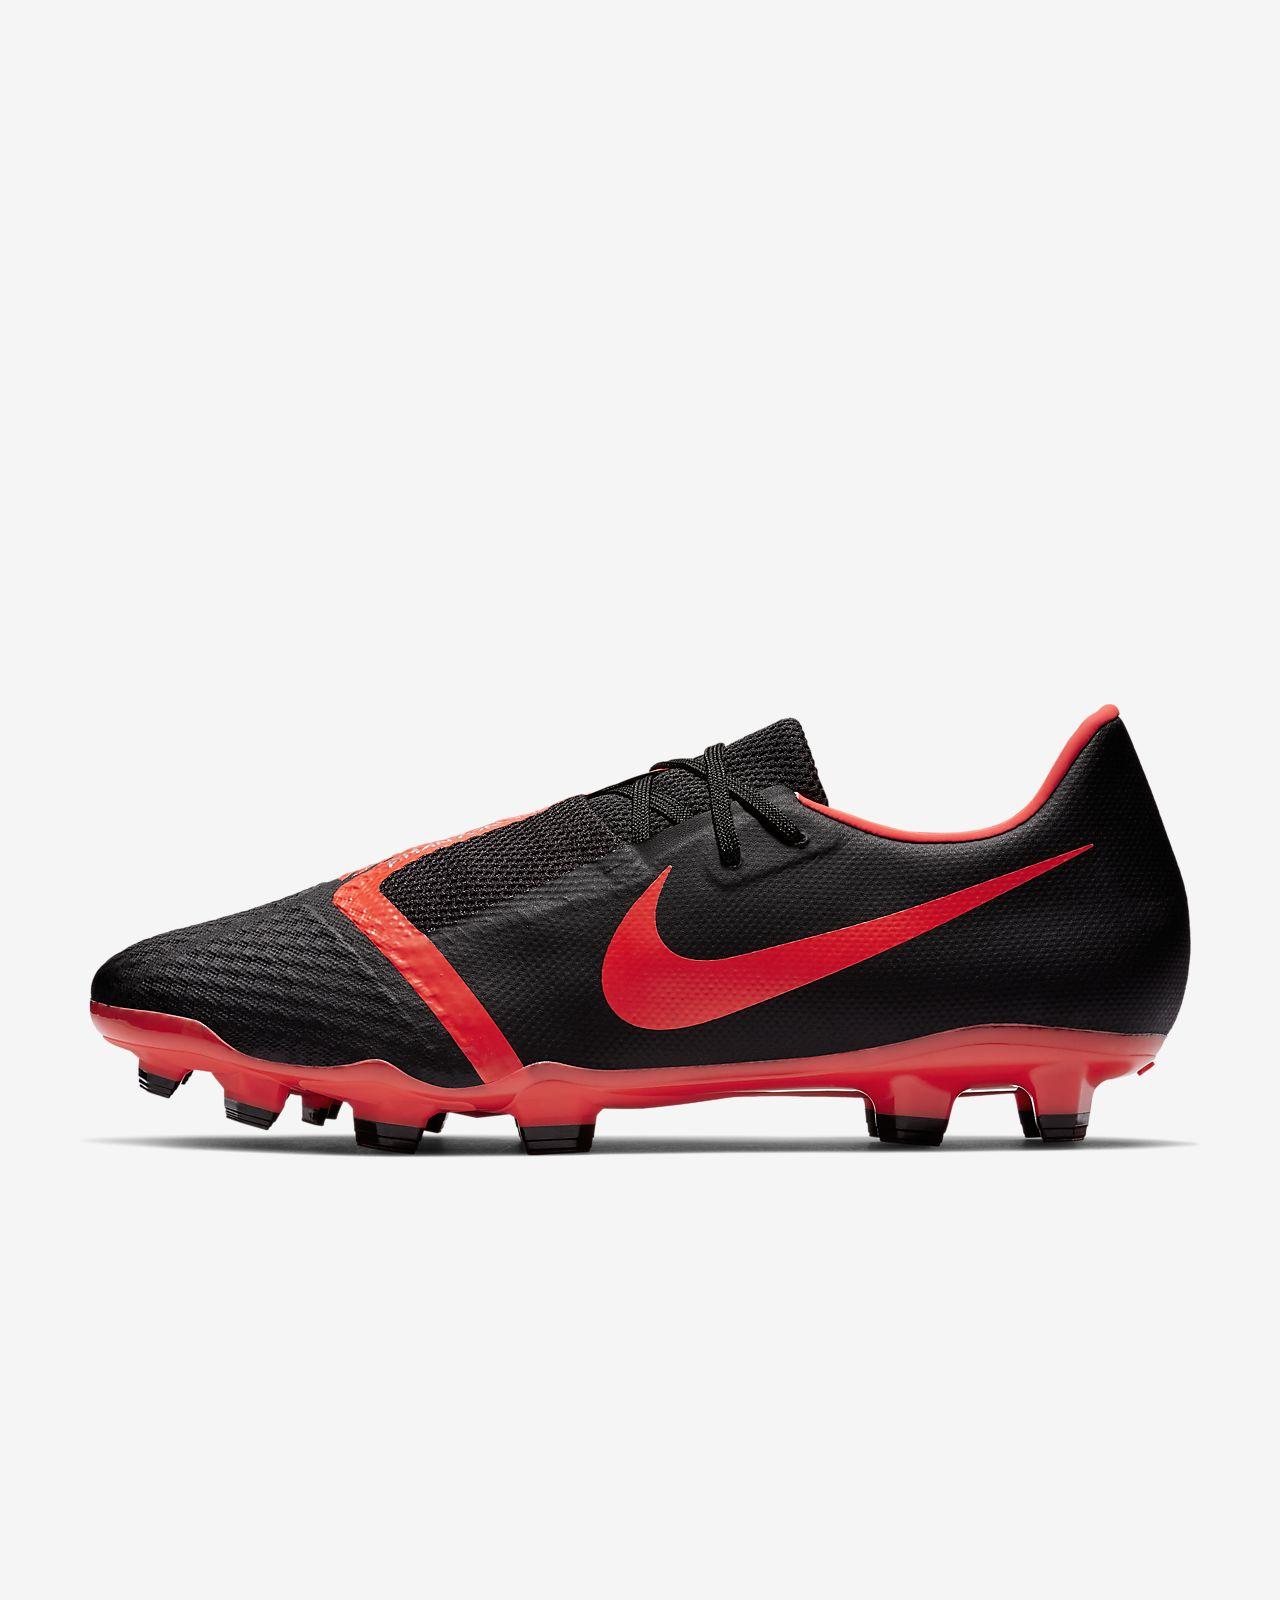 Nike Phantom Venom Academy FG Firm-Ground Football Boot